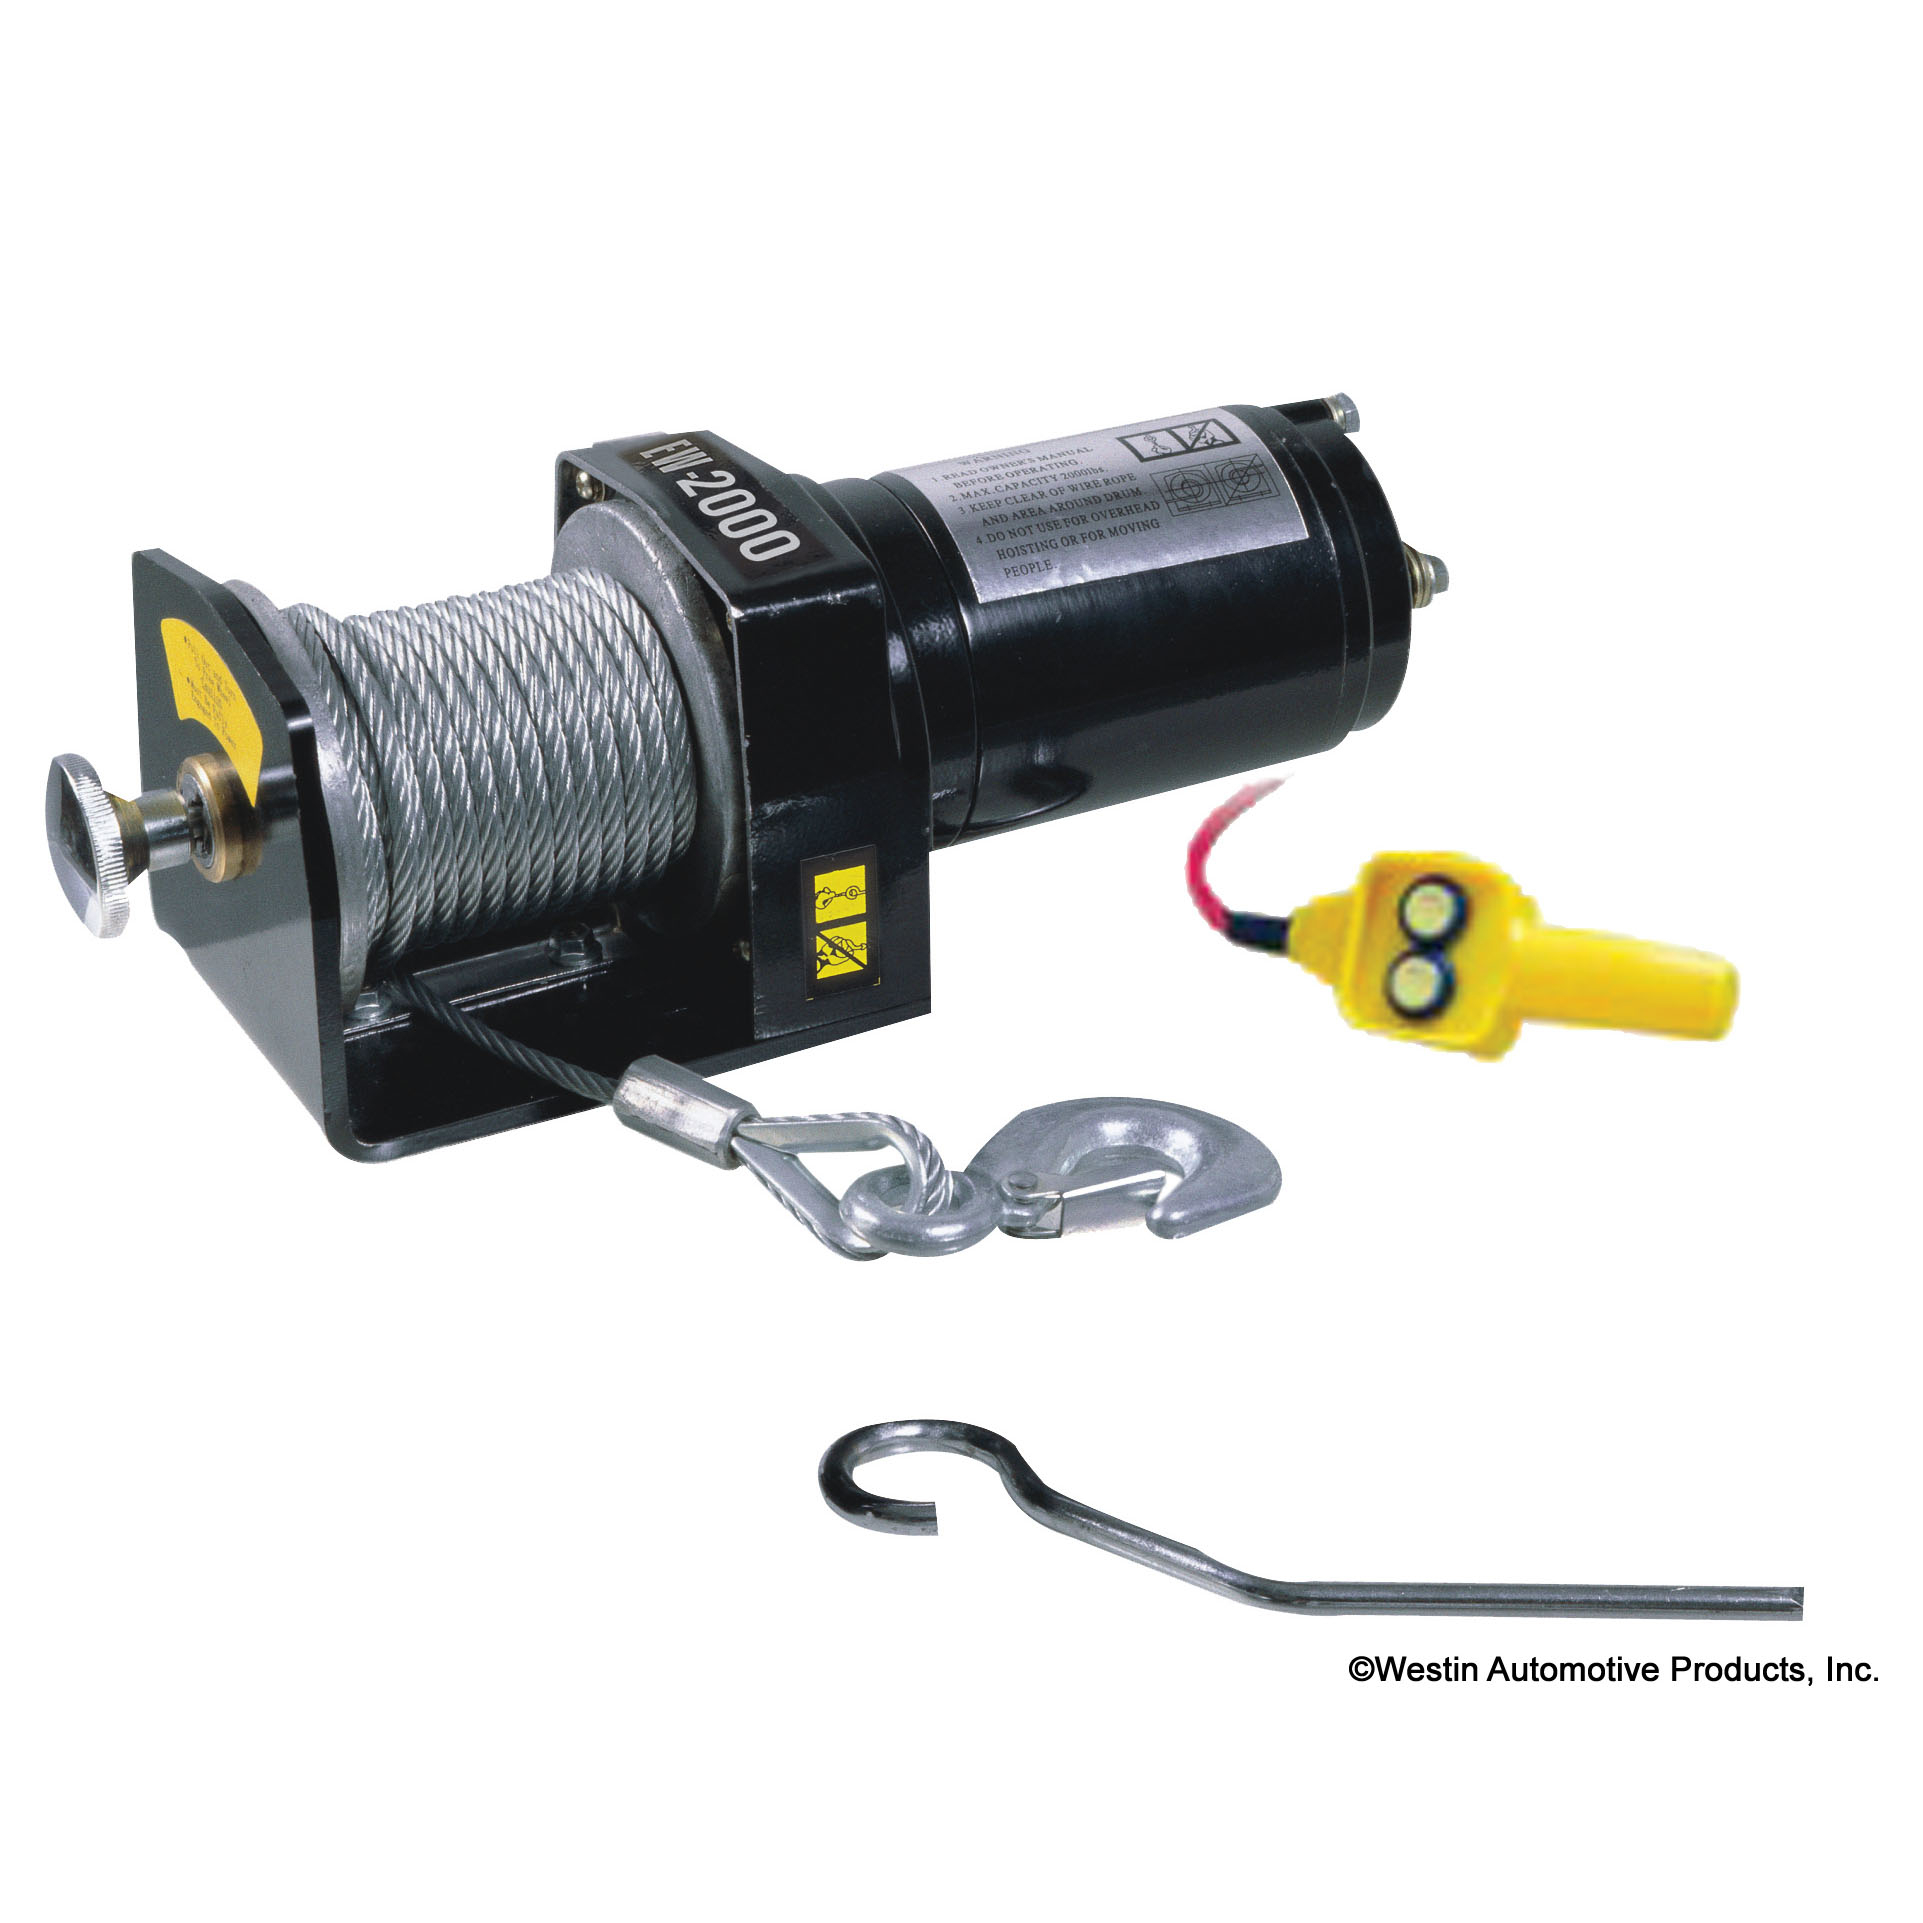 warn 2000 lb atv winch wiring diagram 2004 gmc sierra 2500 radio t max series 2 000 with steel rope